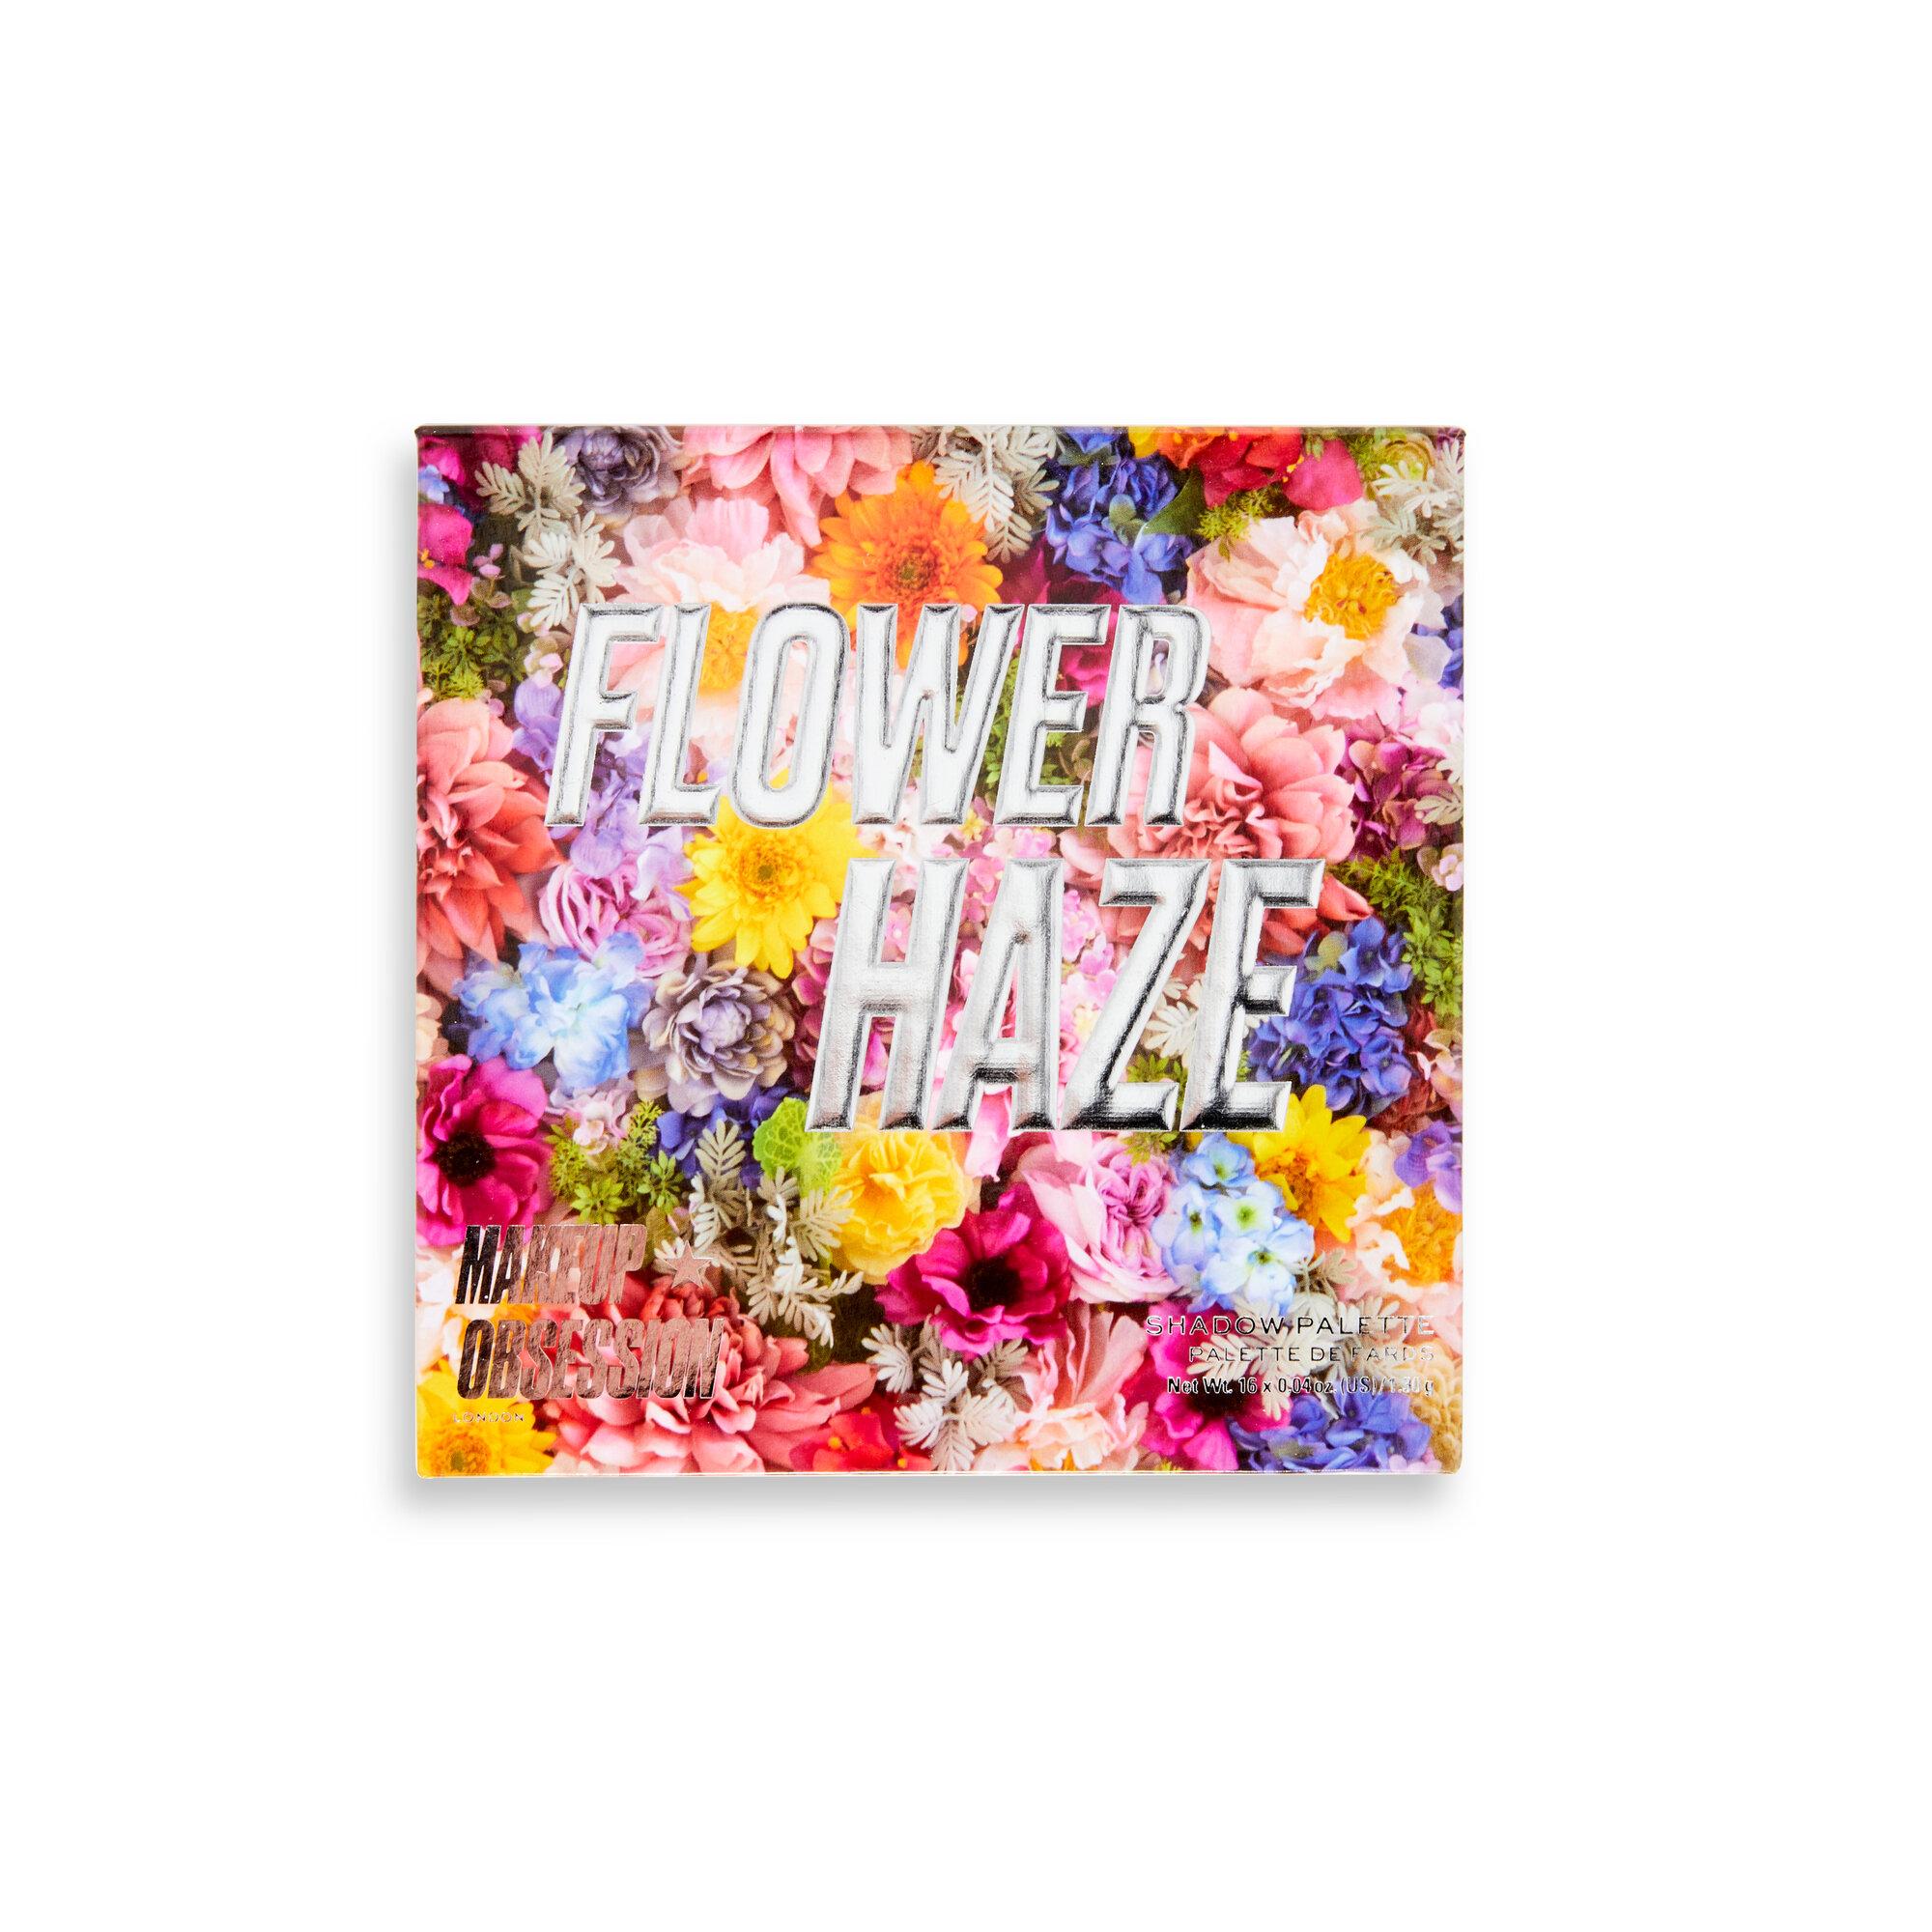 Makeup Obsession Flower Haze Eyeshadow Palette